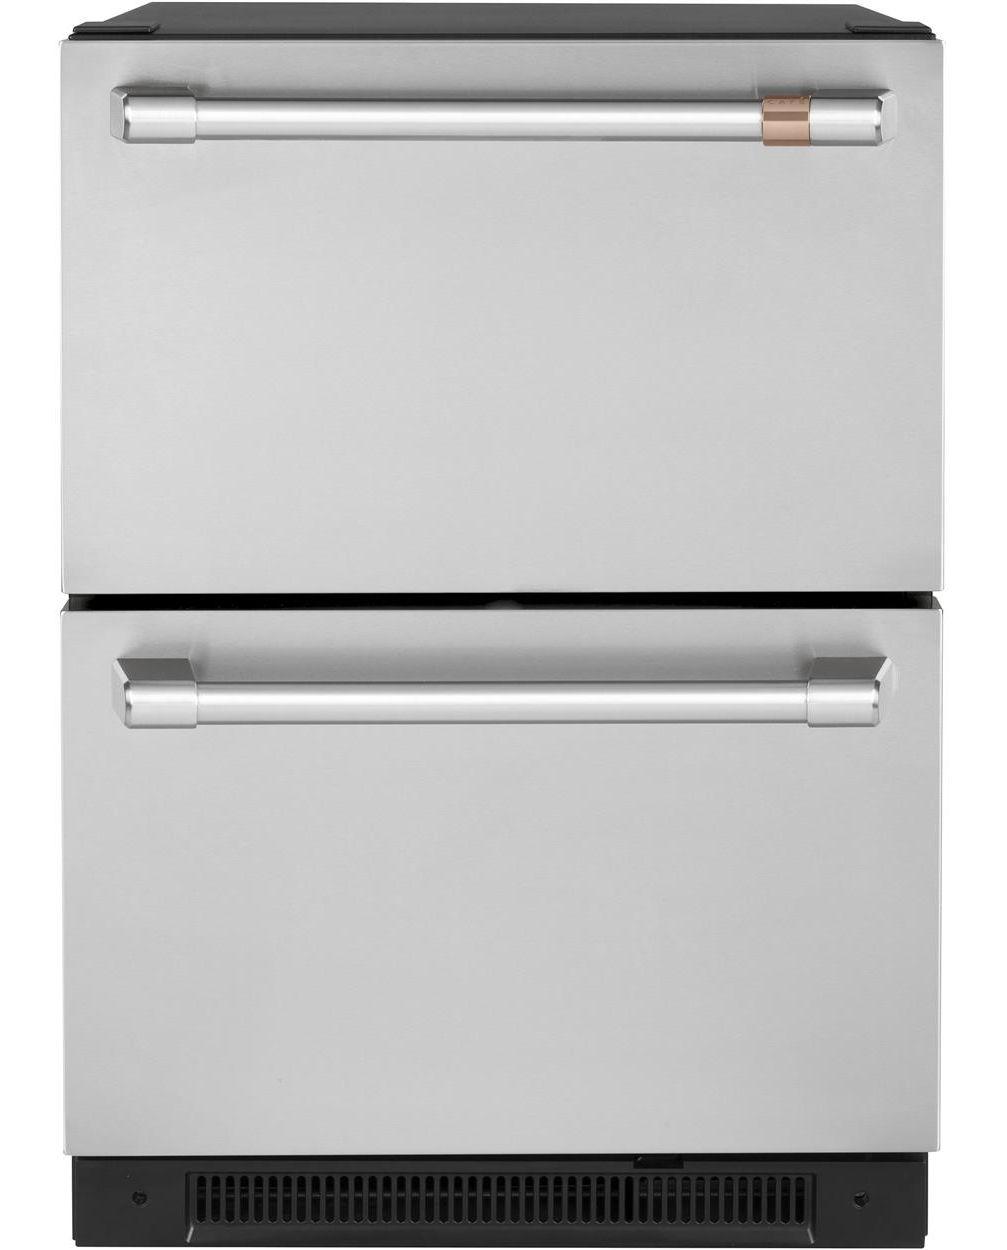 Other Refrigerators |Kitchen Appliances|Used Appliances & Parts|48146